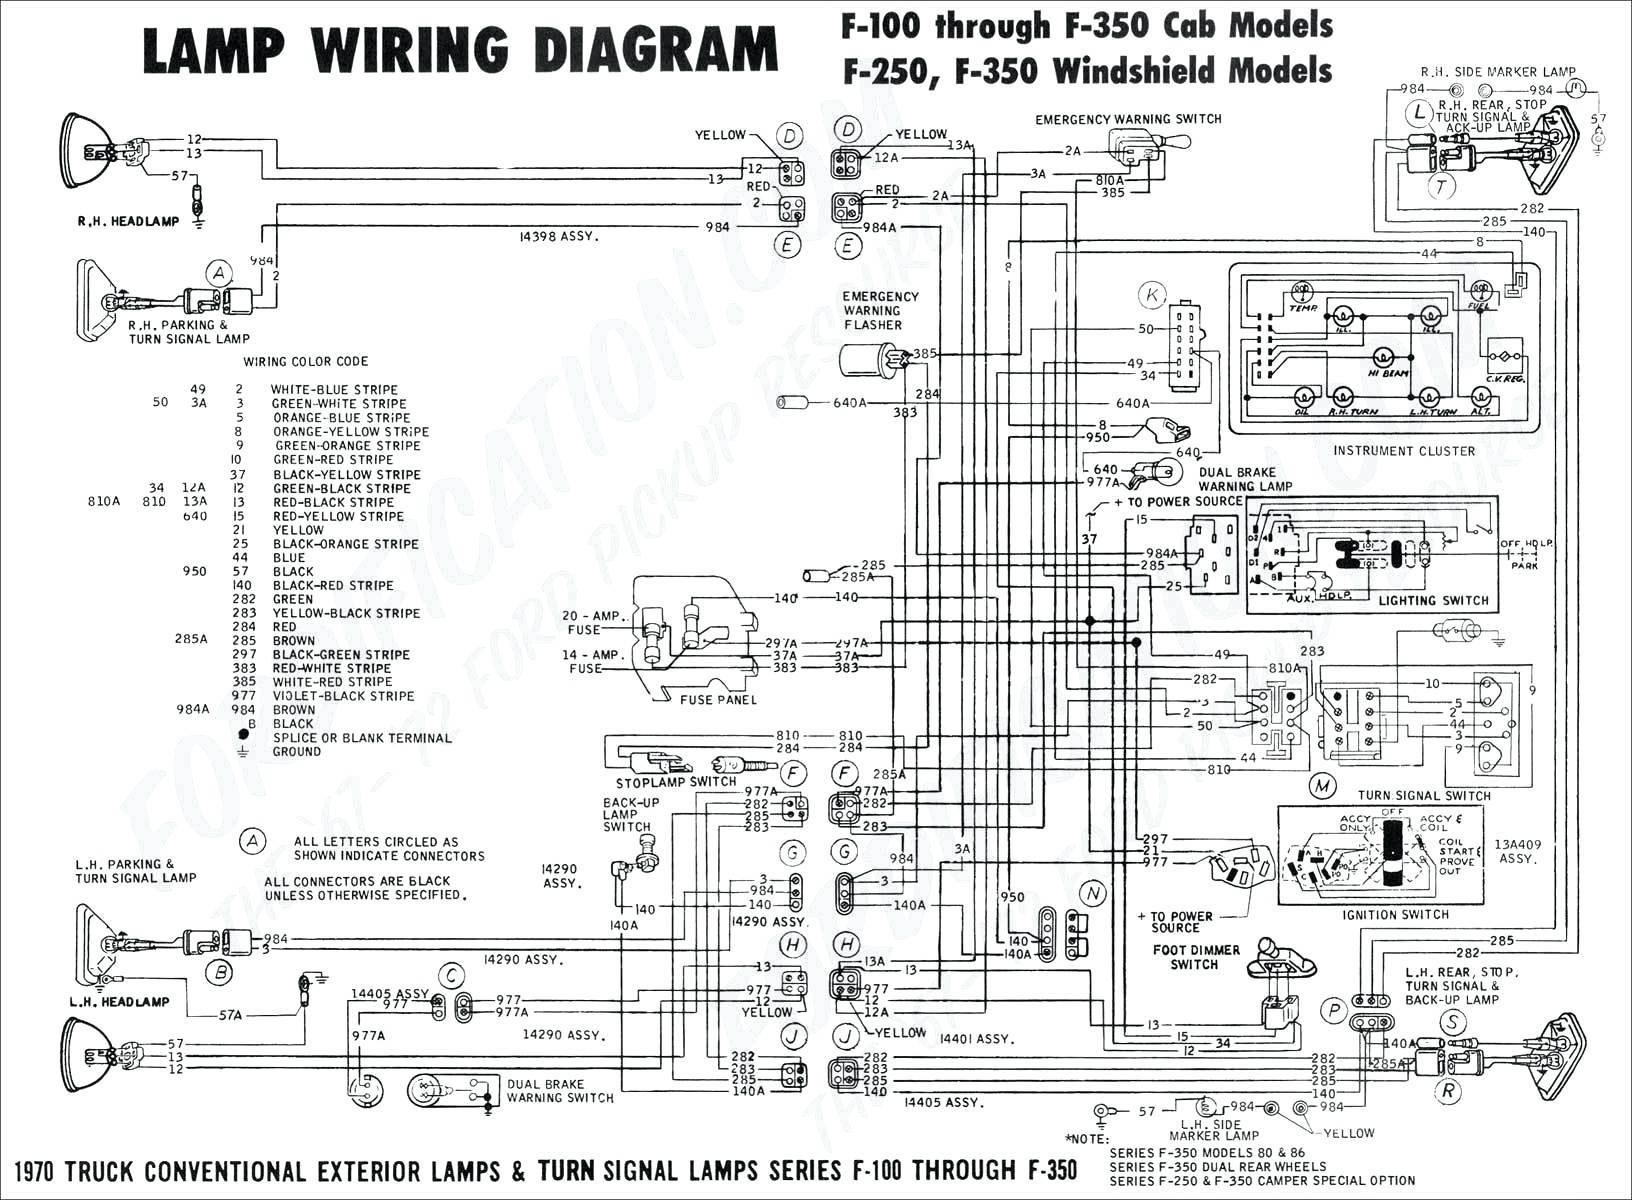 2002 mercury mountaineer engine diagram